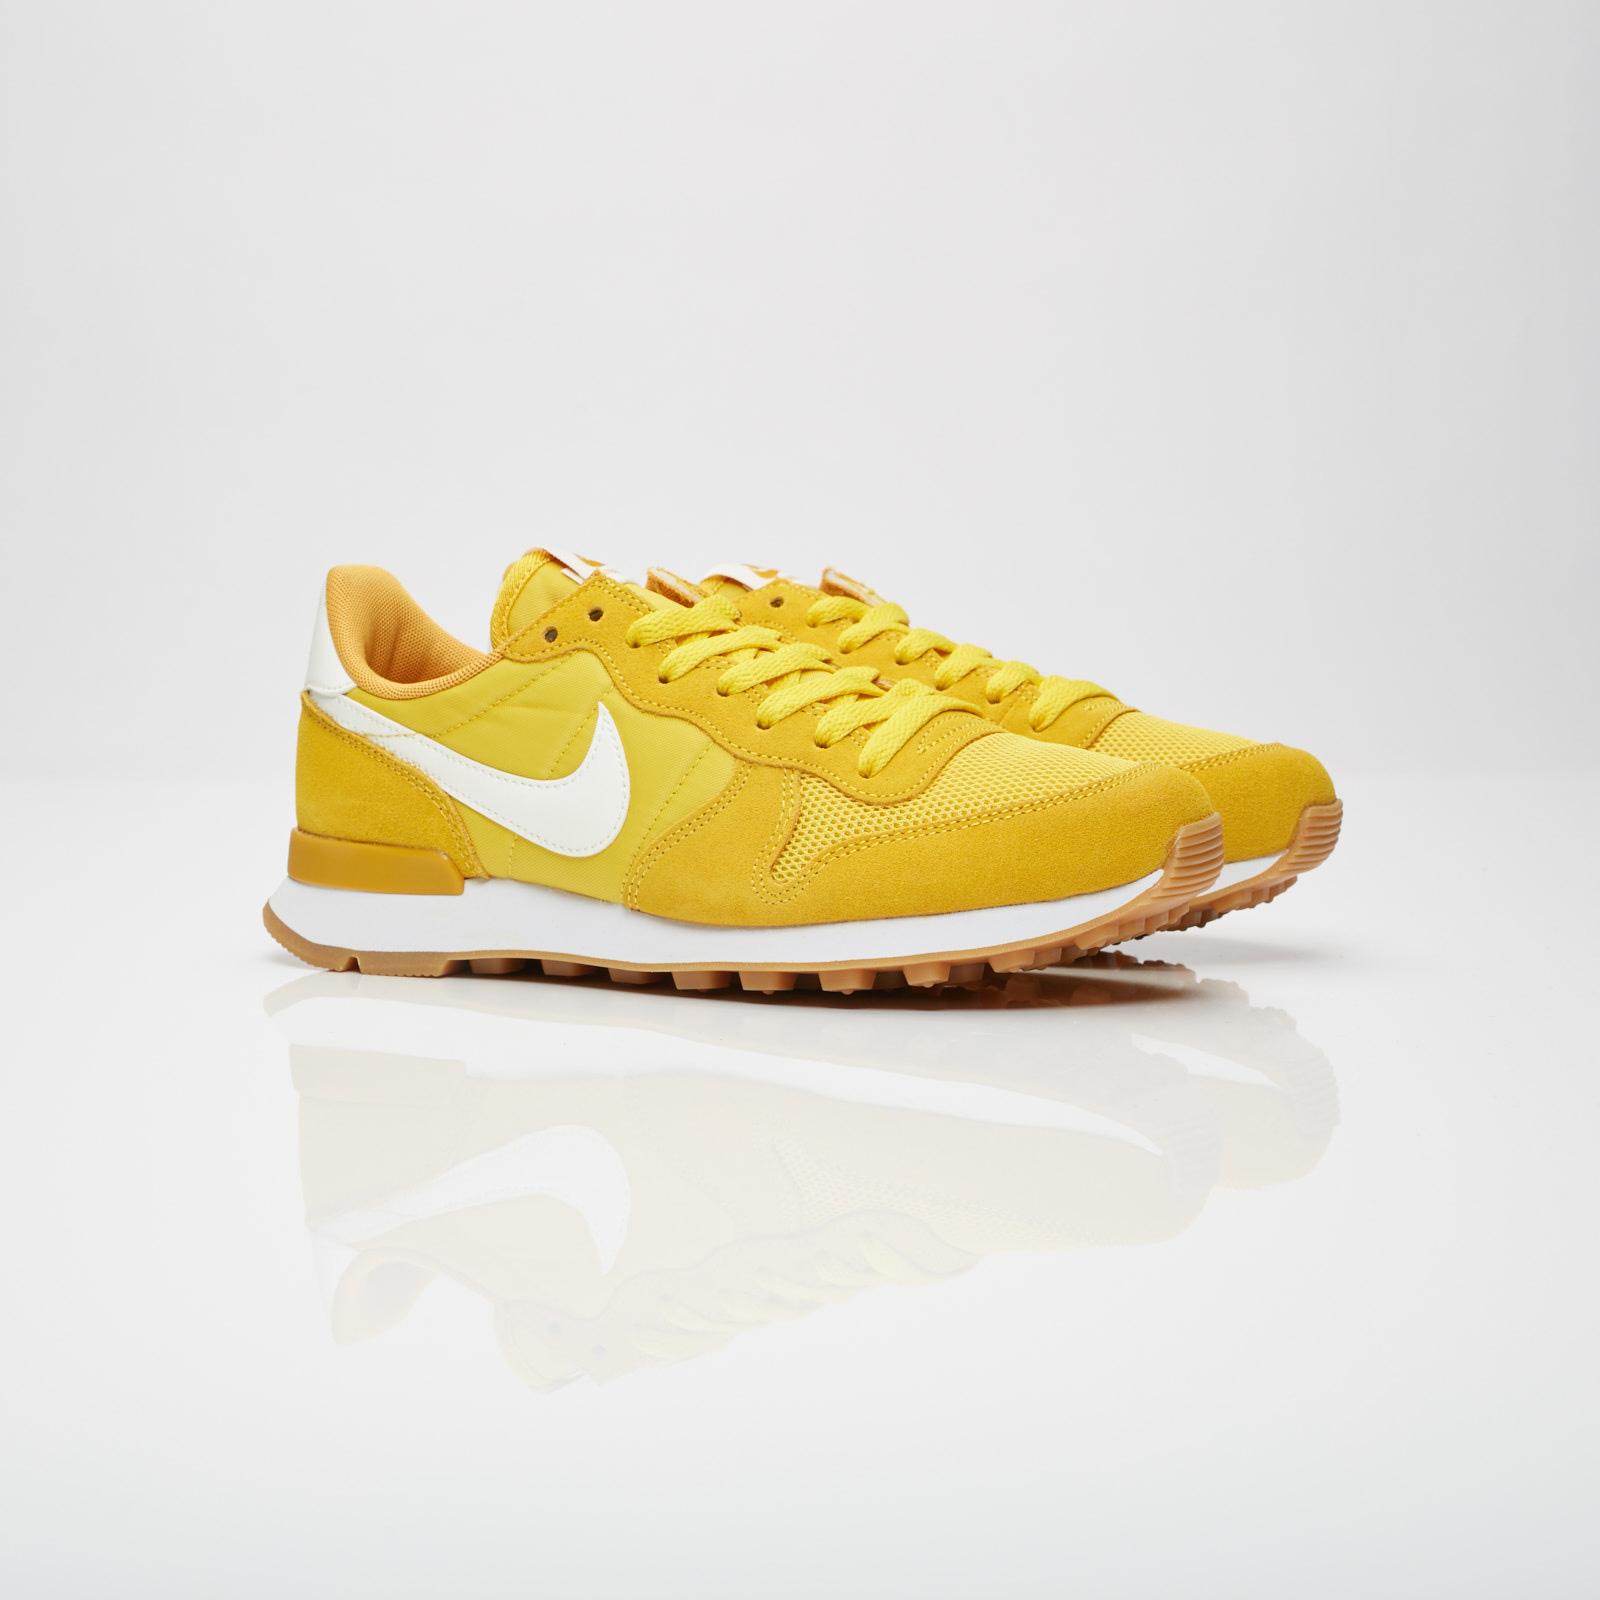 super popular 6a3f0 0c890 Nike Sportswear Wmns Internationalist